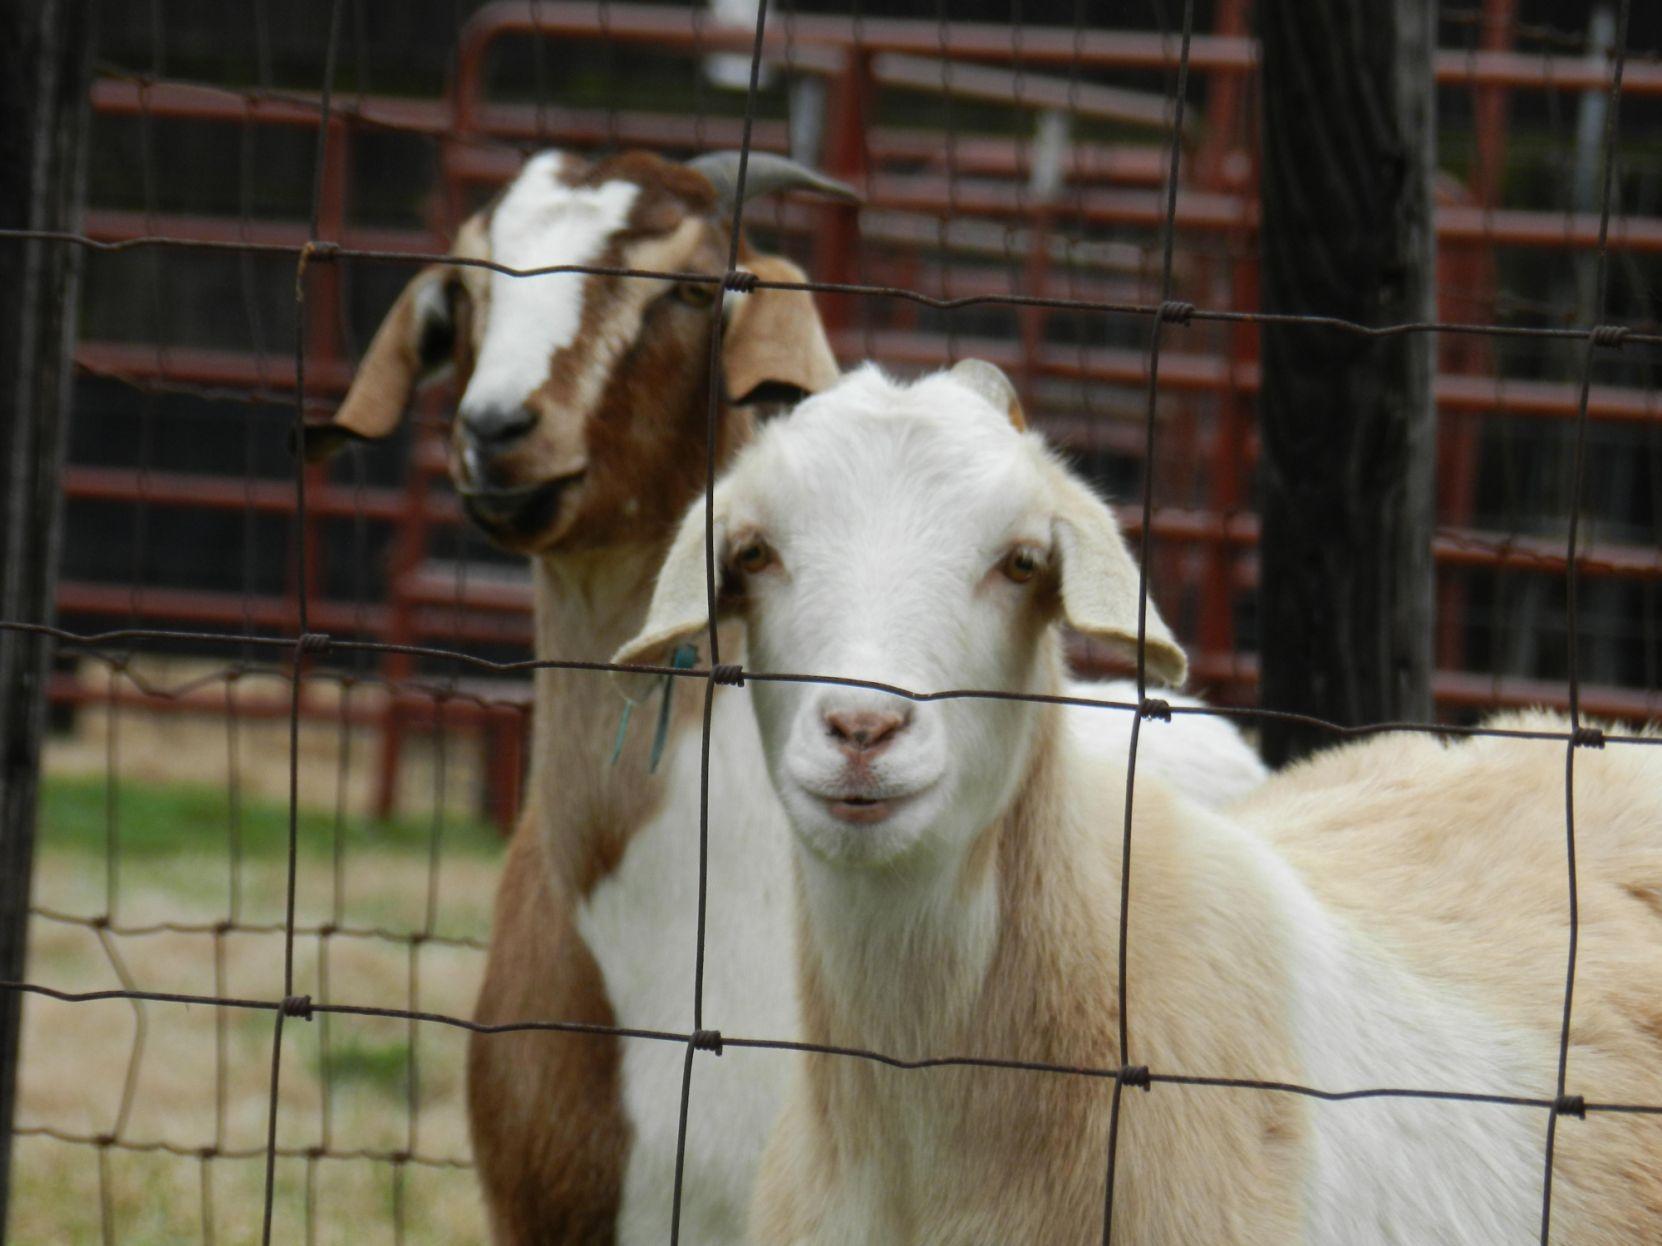 elkmont goat farm essay